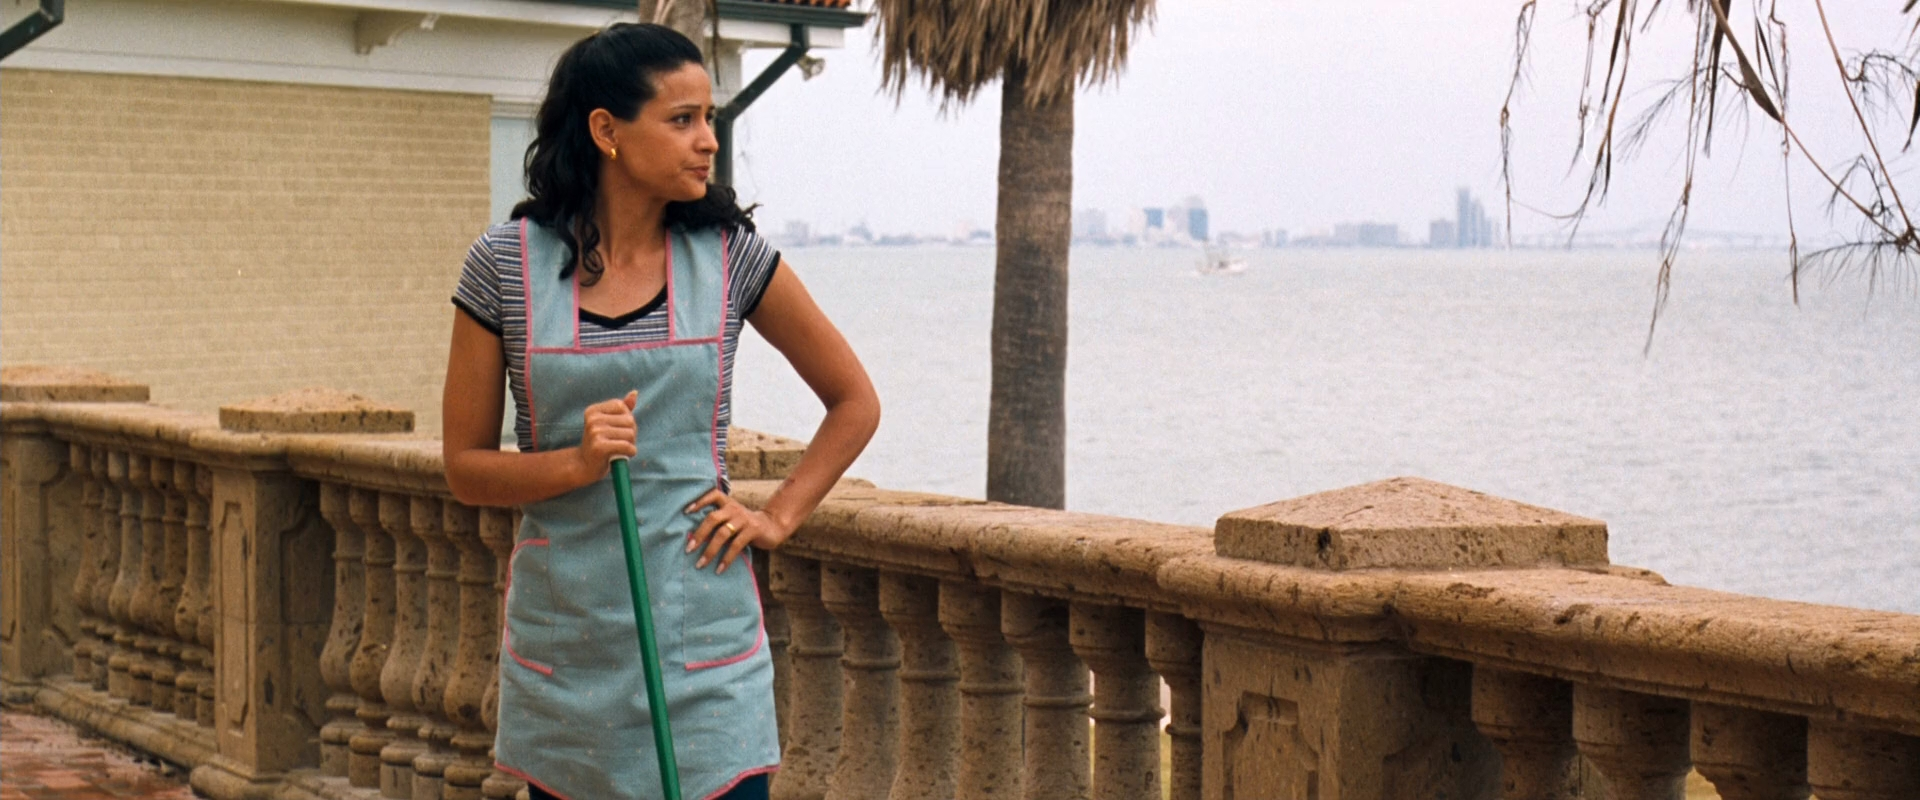 Selena (1997) Extended Cut 1080p BRRip Latino - Ingles